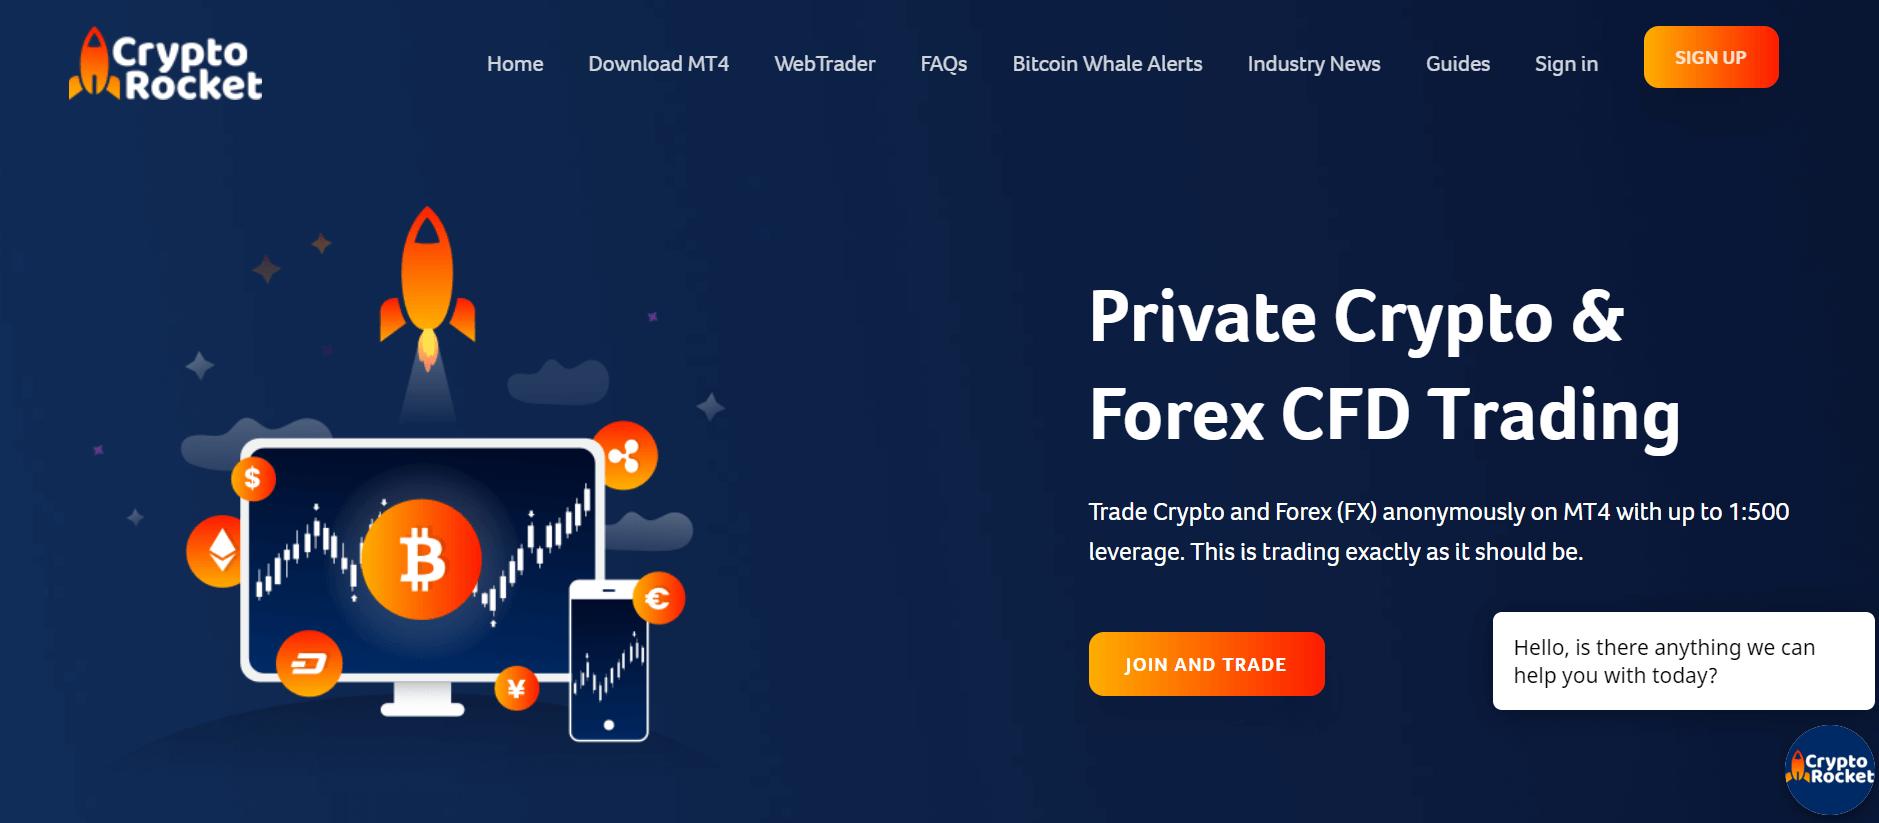 buy iota cryptocurrency nz